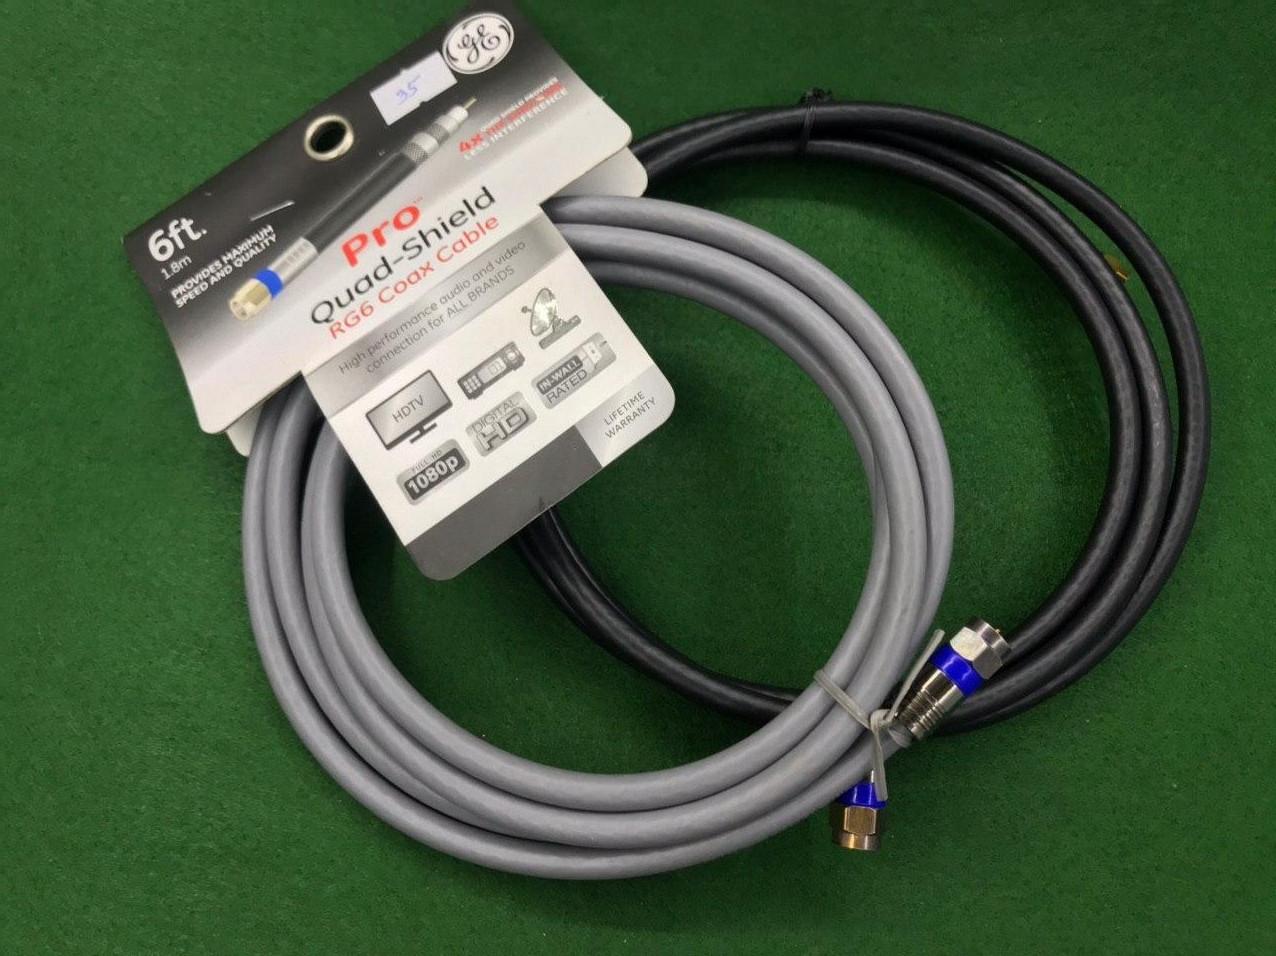 Коаксиальний кабель Pro Quad-Shield RG6 Coax Cable